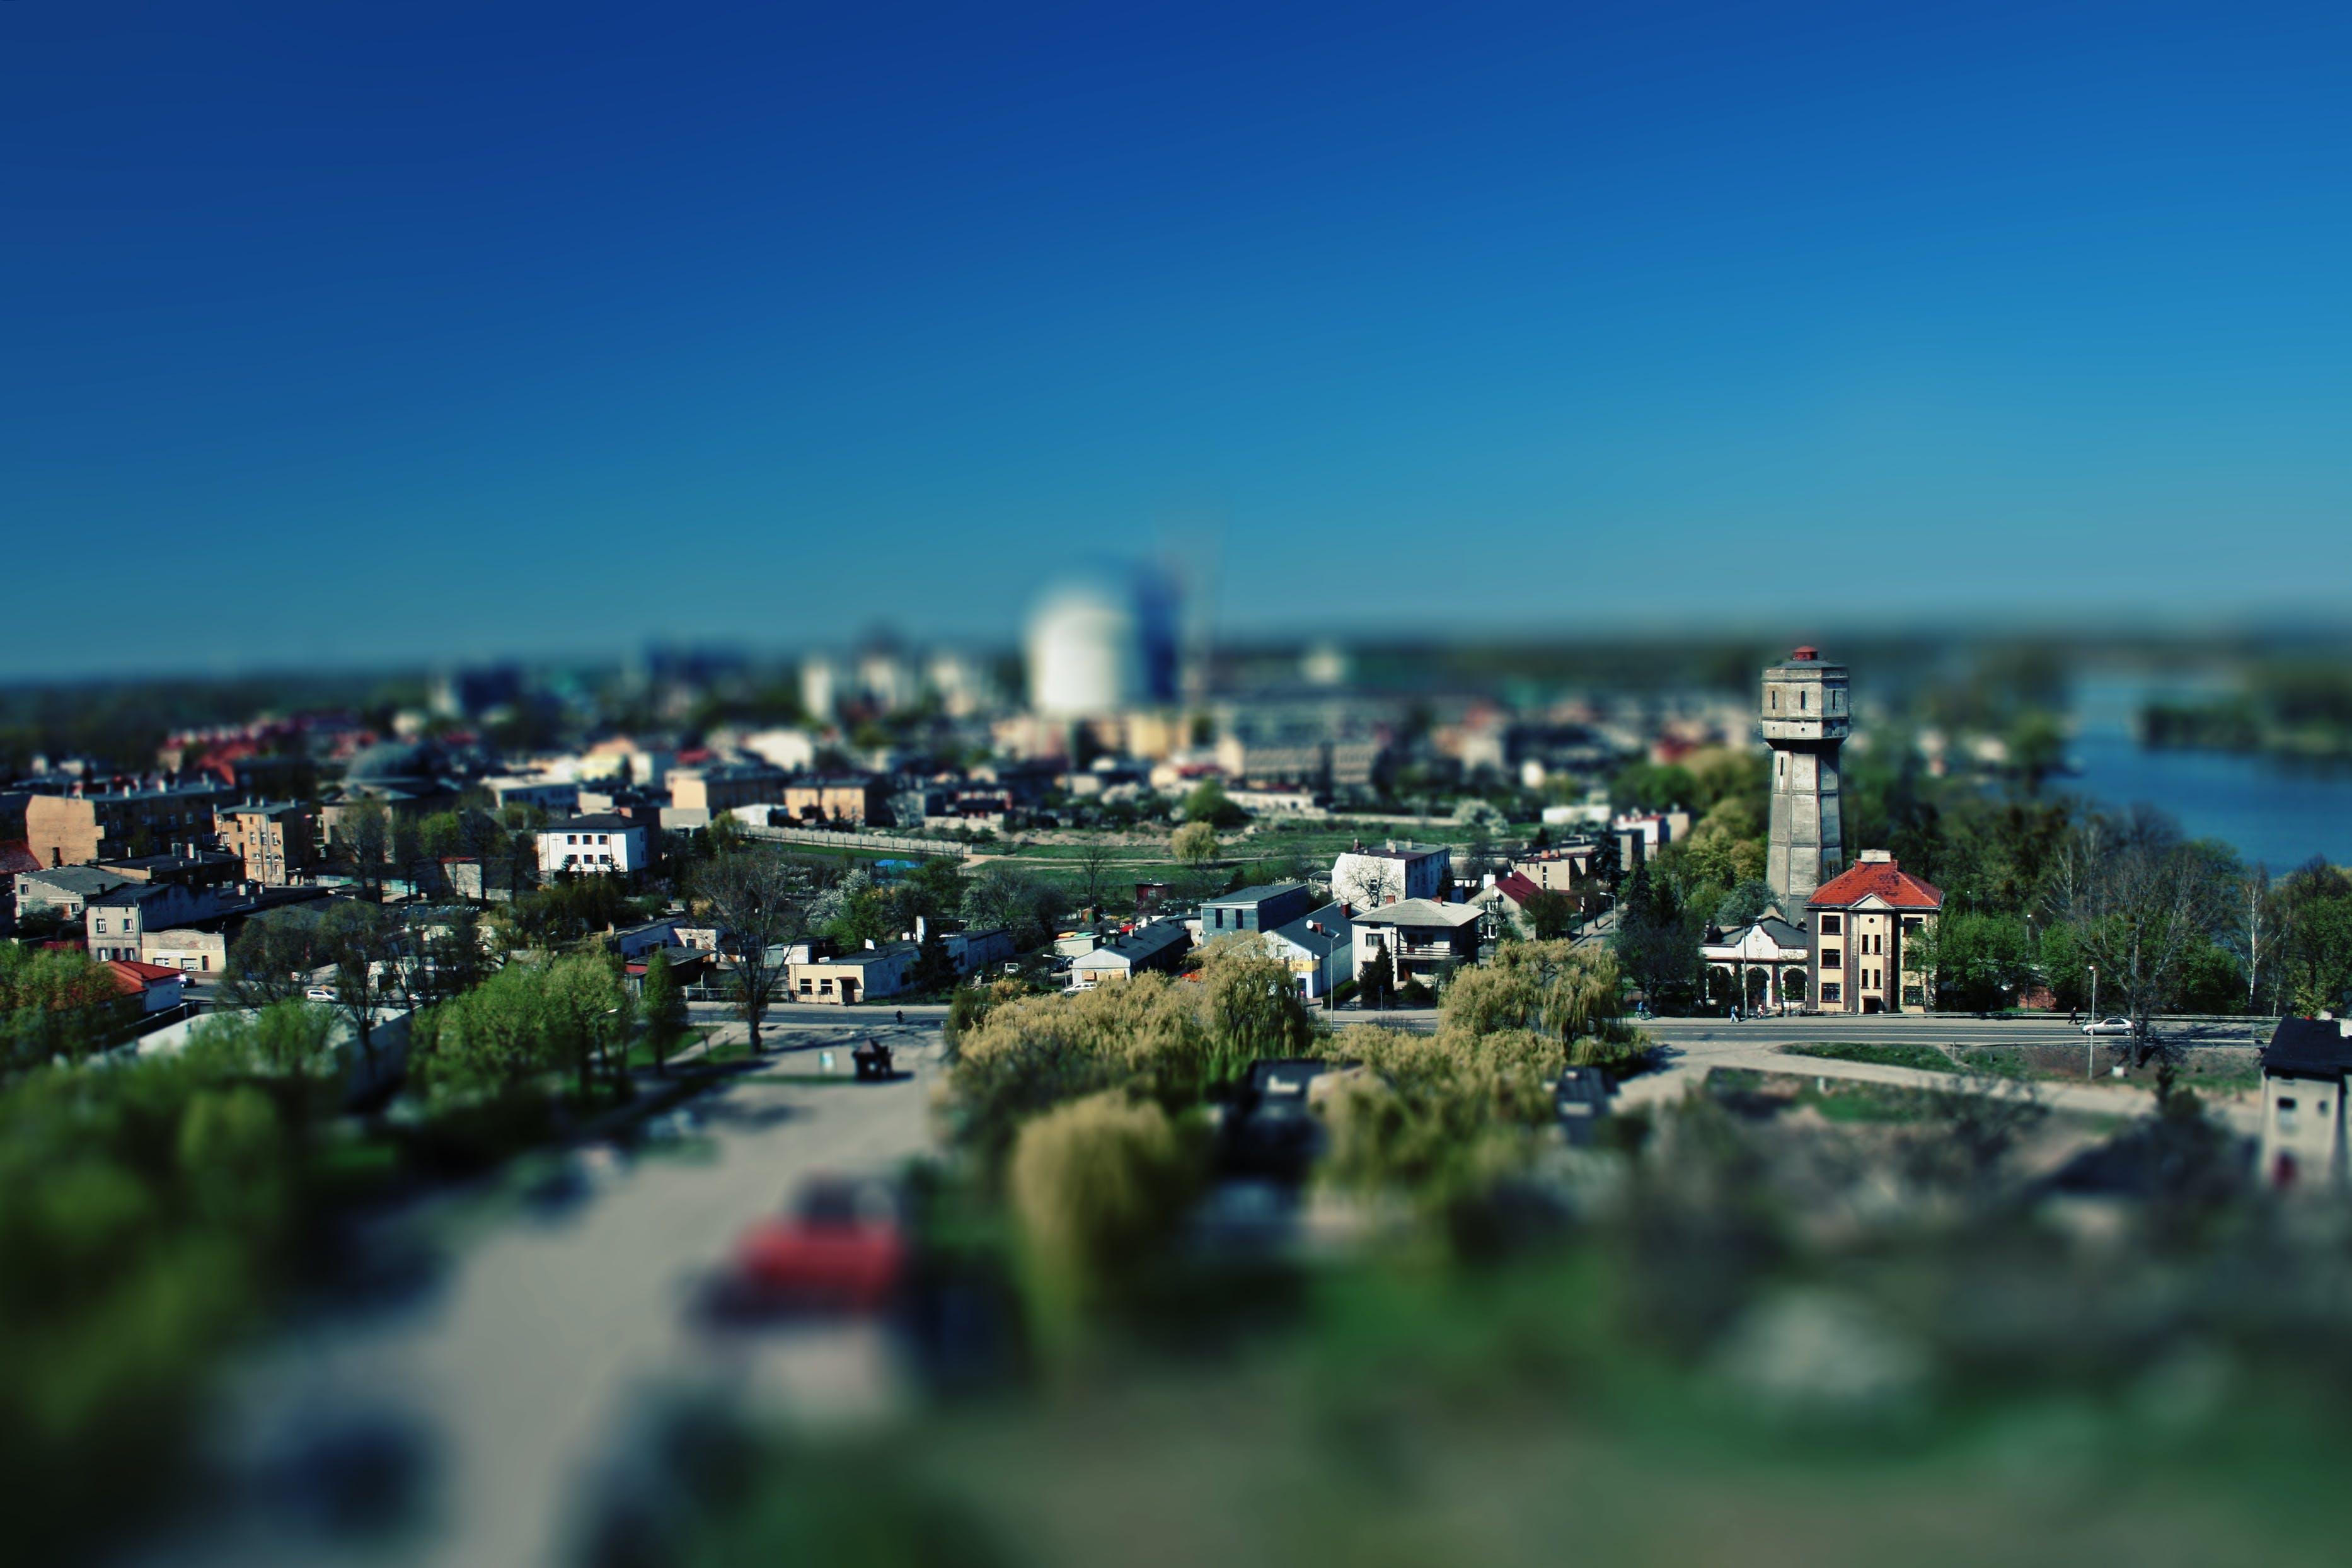 Kruszwica City